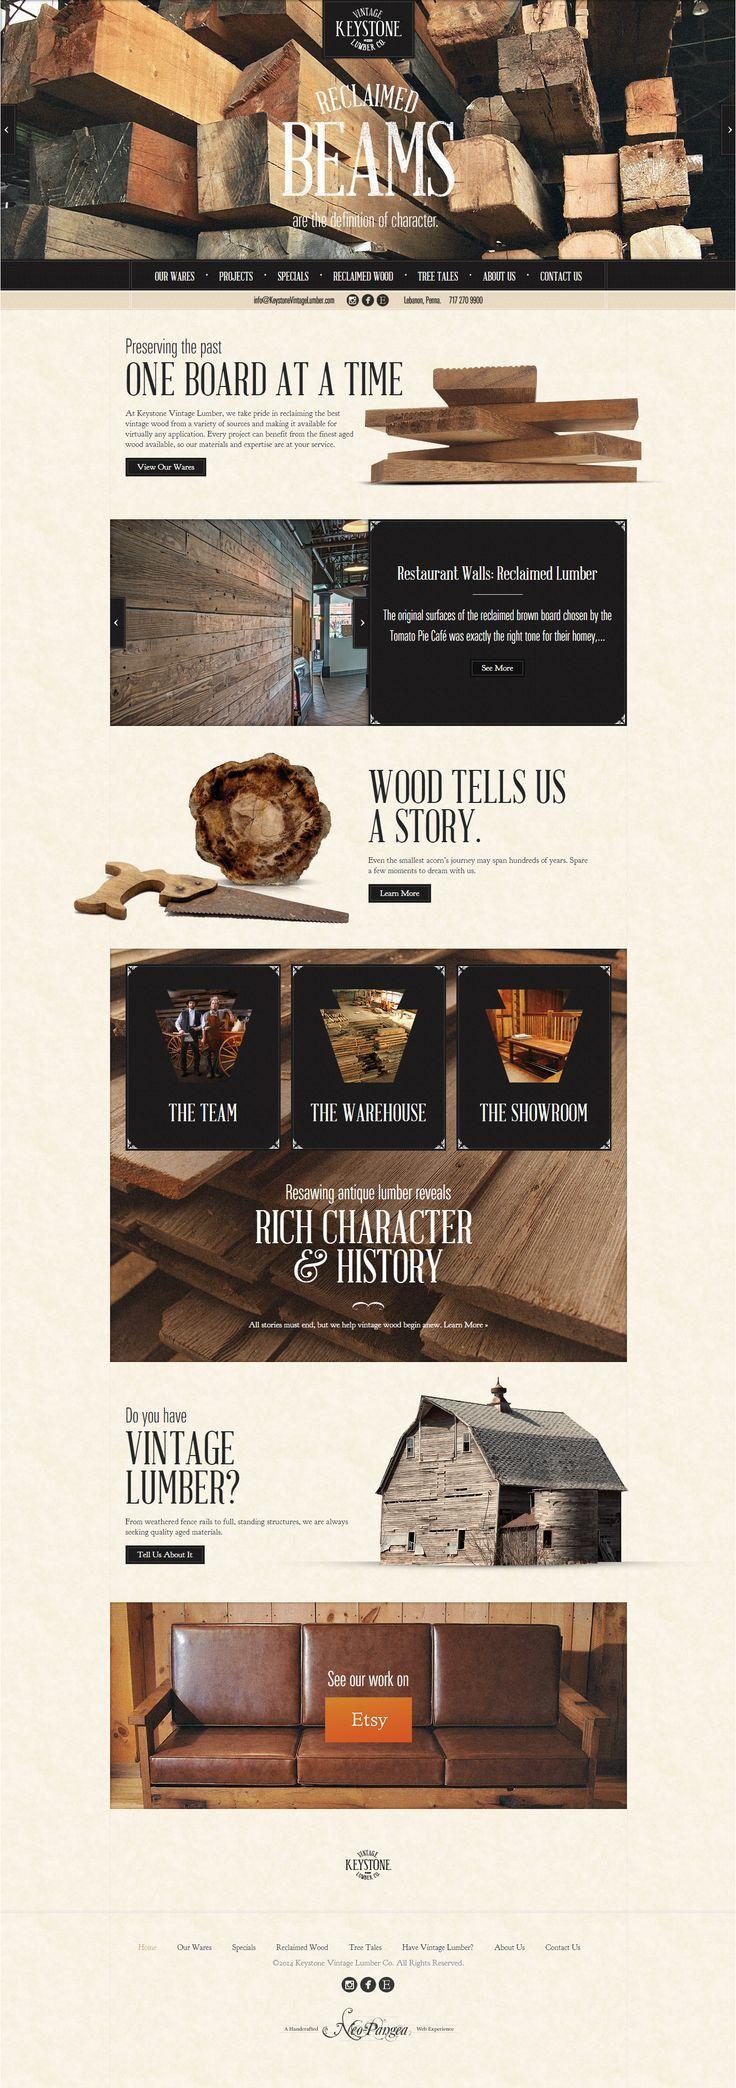 Unique Web Design, Keystone Vintage Lumber by http://www.neo-pangea.com/ #Web #Design #Vintage